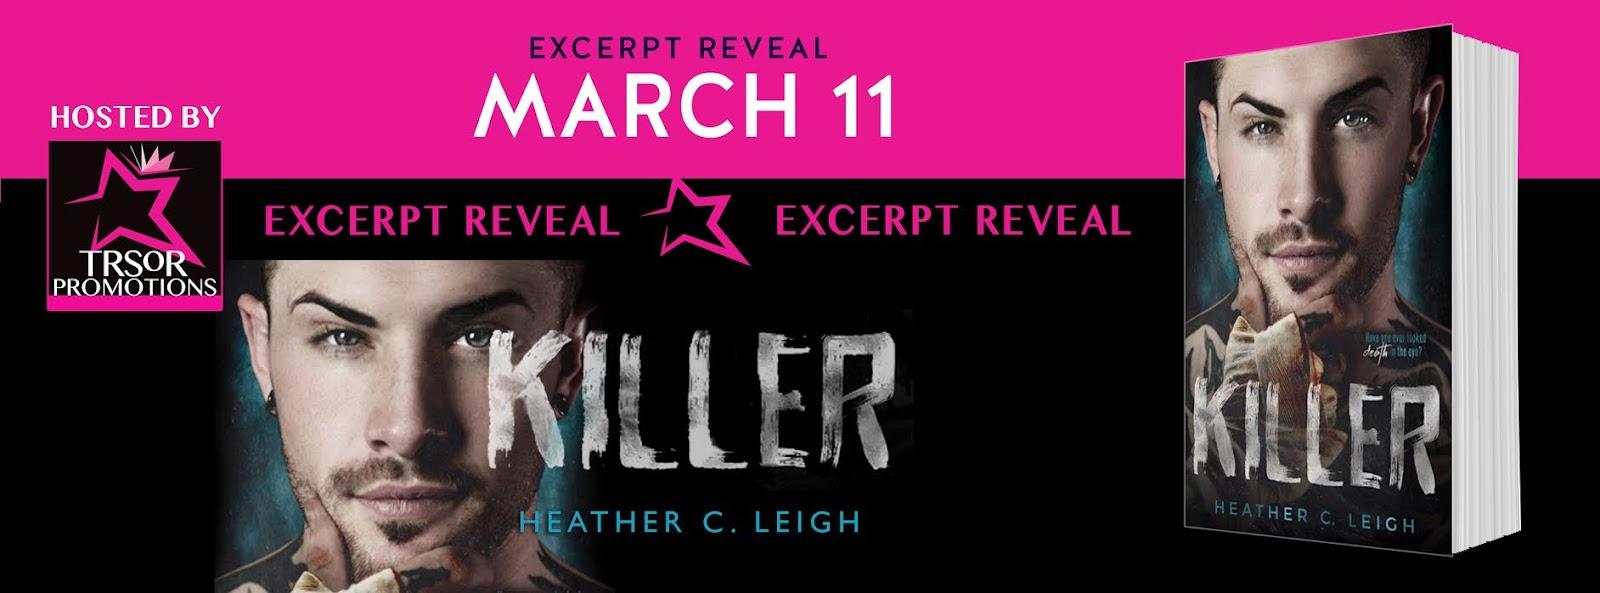 killer excerpt reveal.jpg